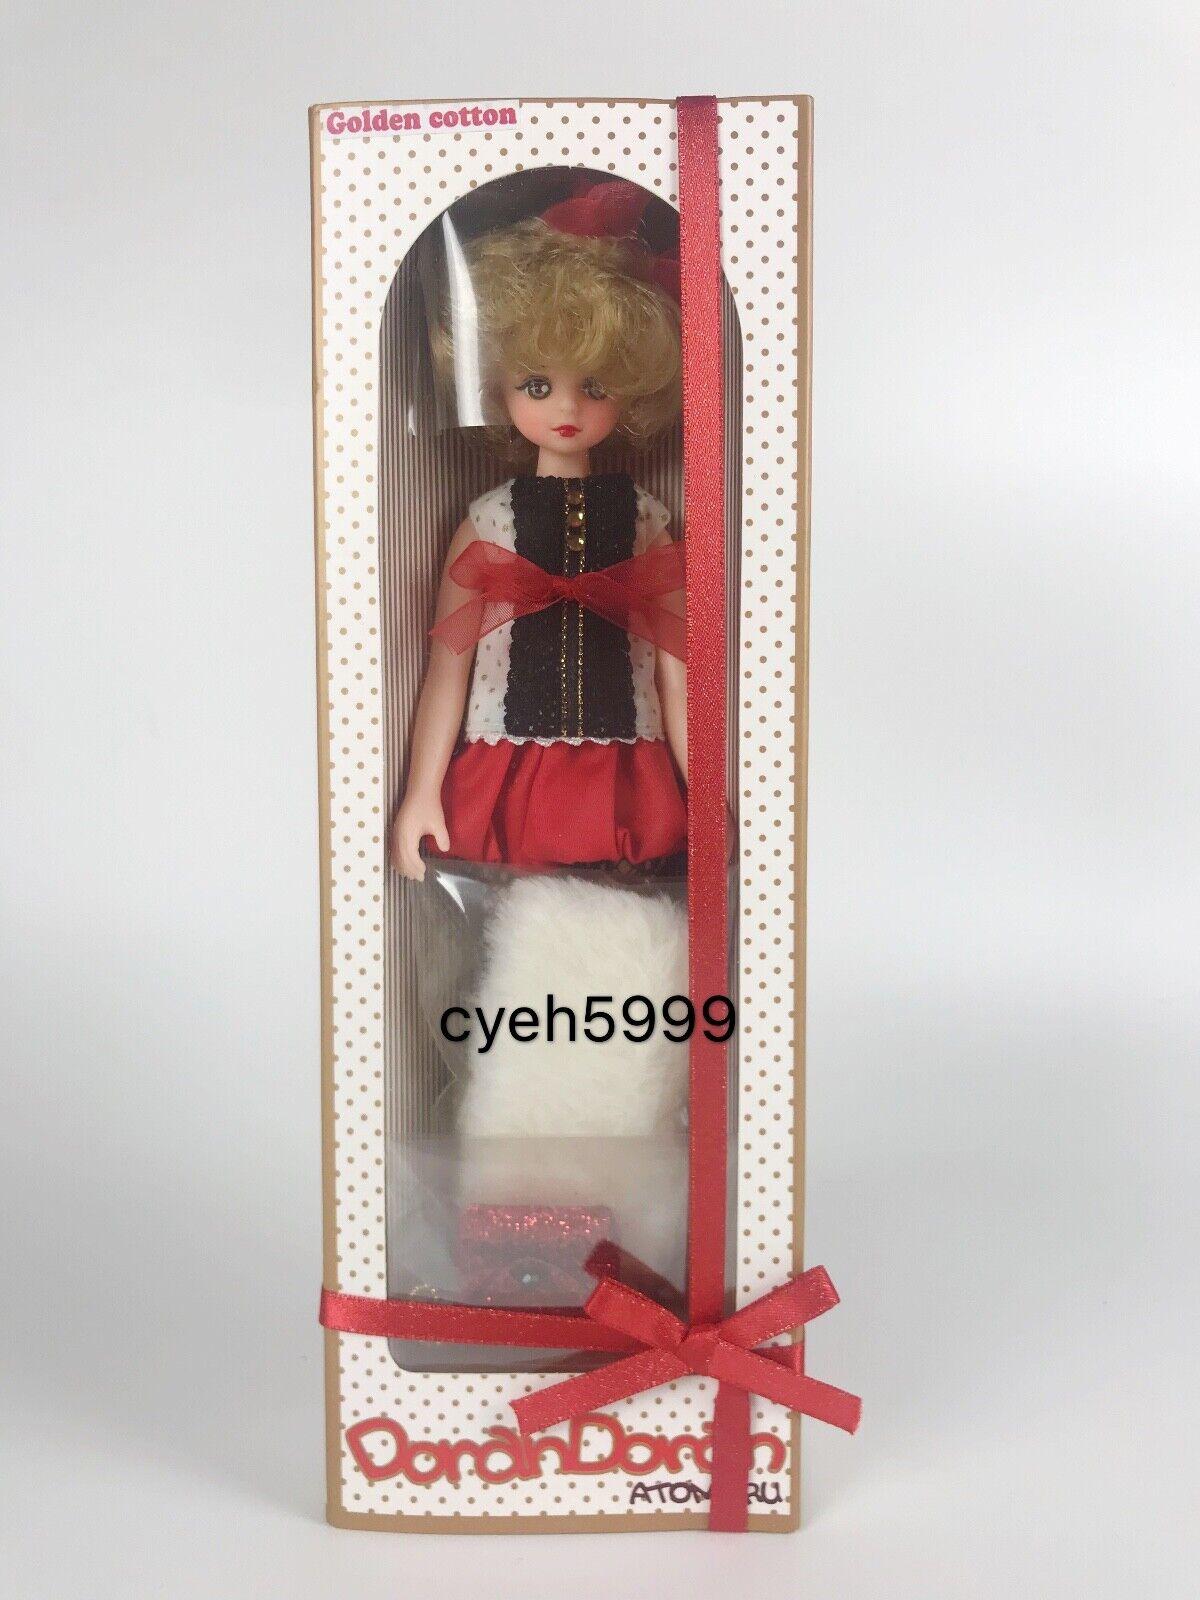 Doran Doran oroen Algodón Limitado Raro muñeca Corea Nuevo En Caja